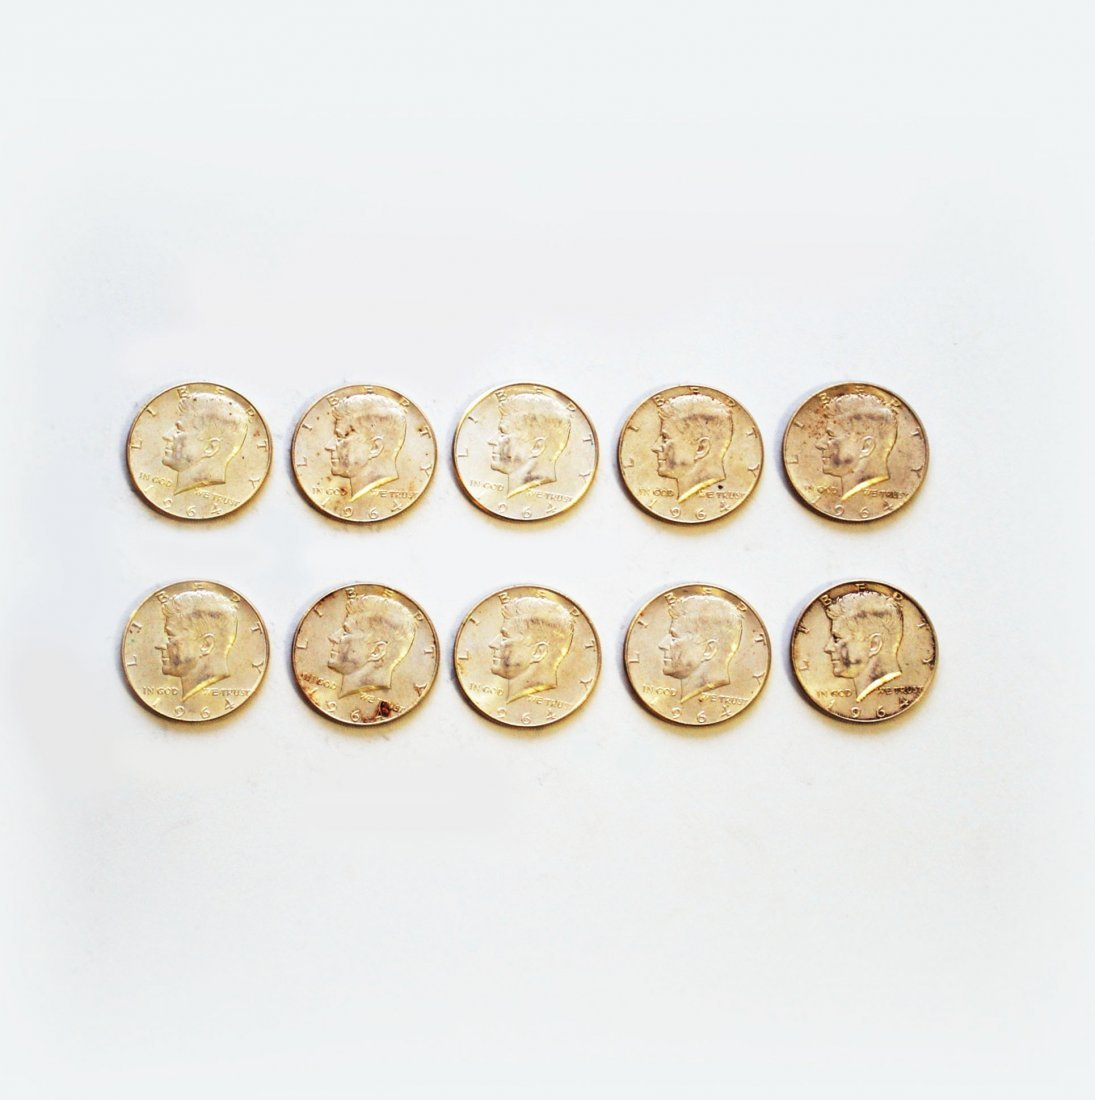 Ten (10) Kennedy Half-Dollars, 1964